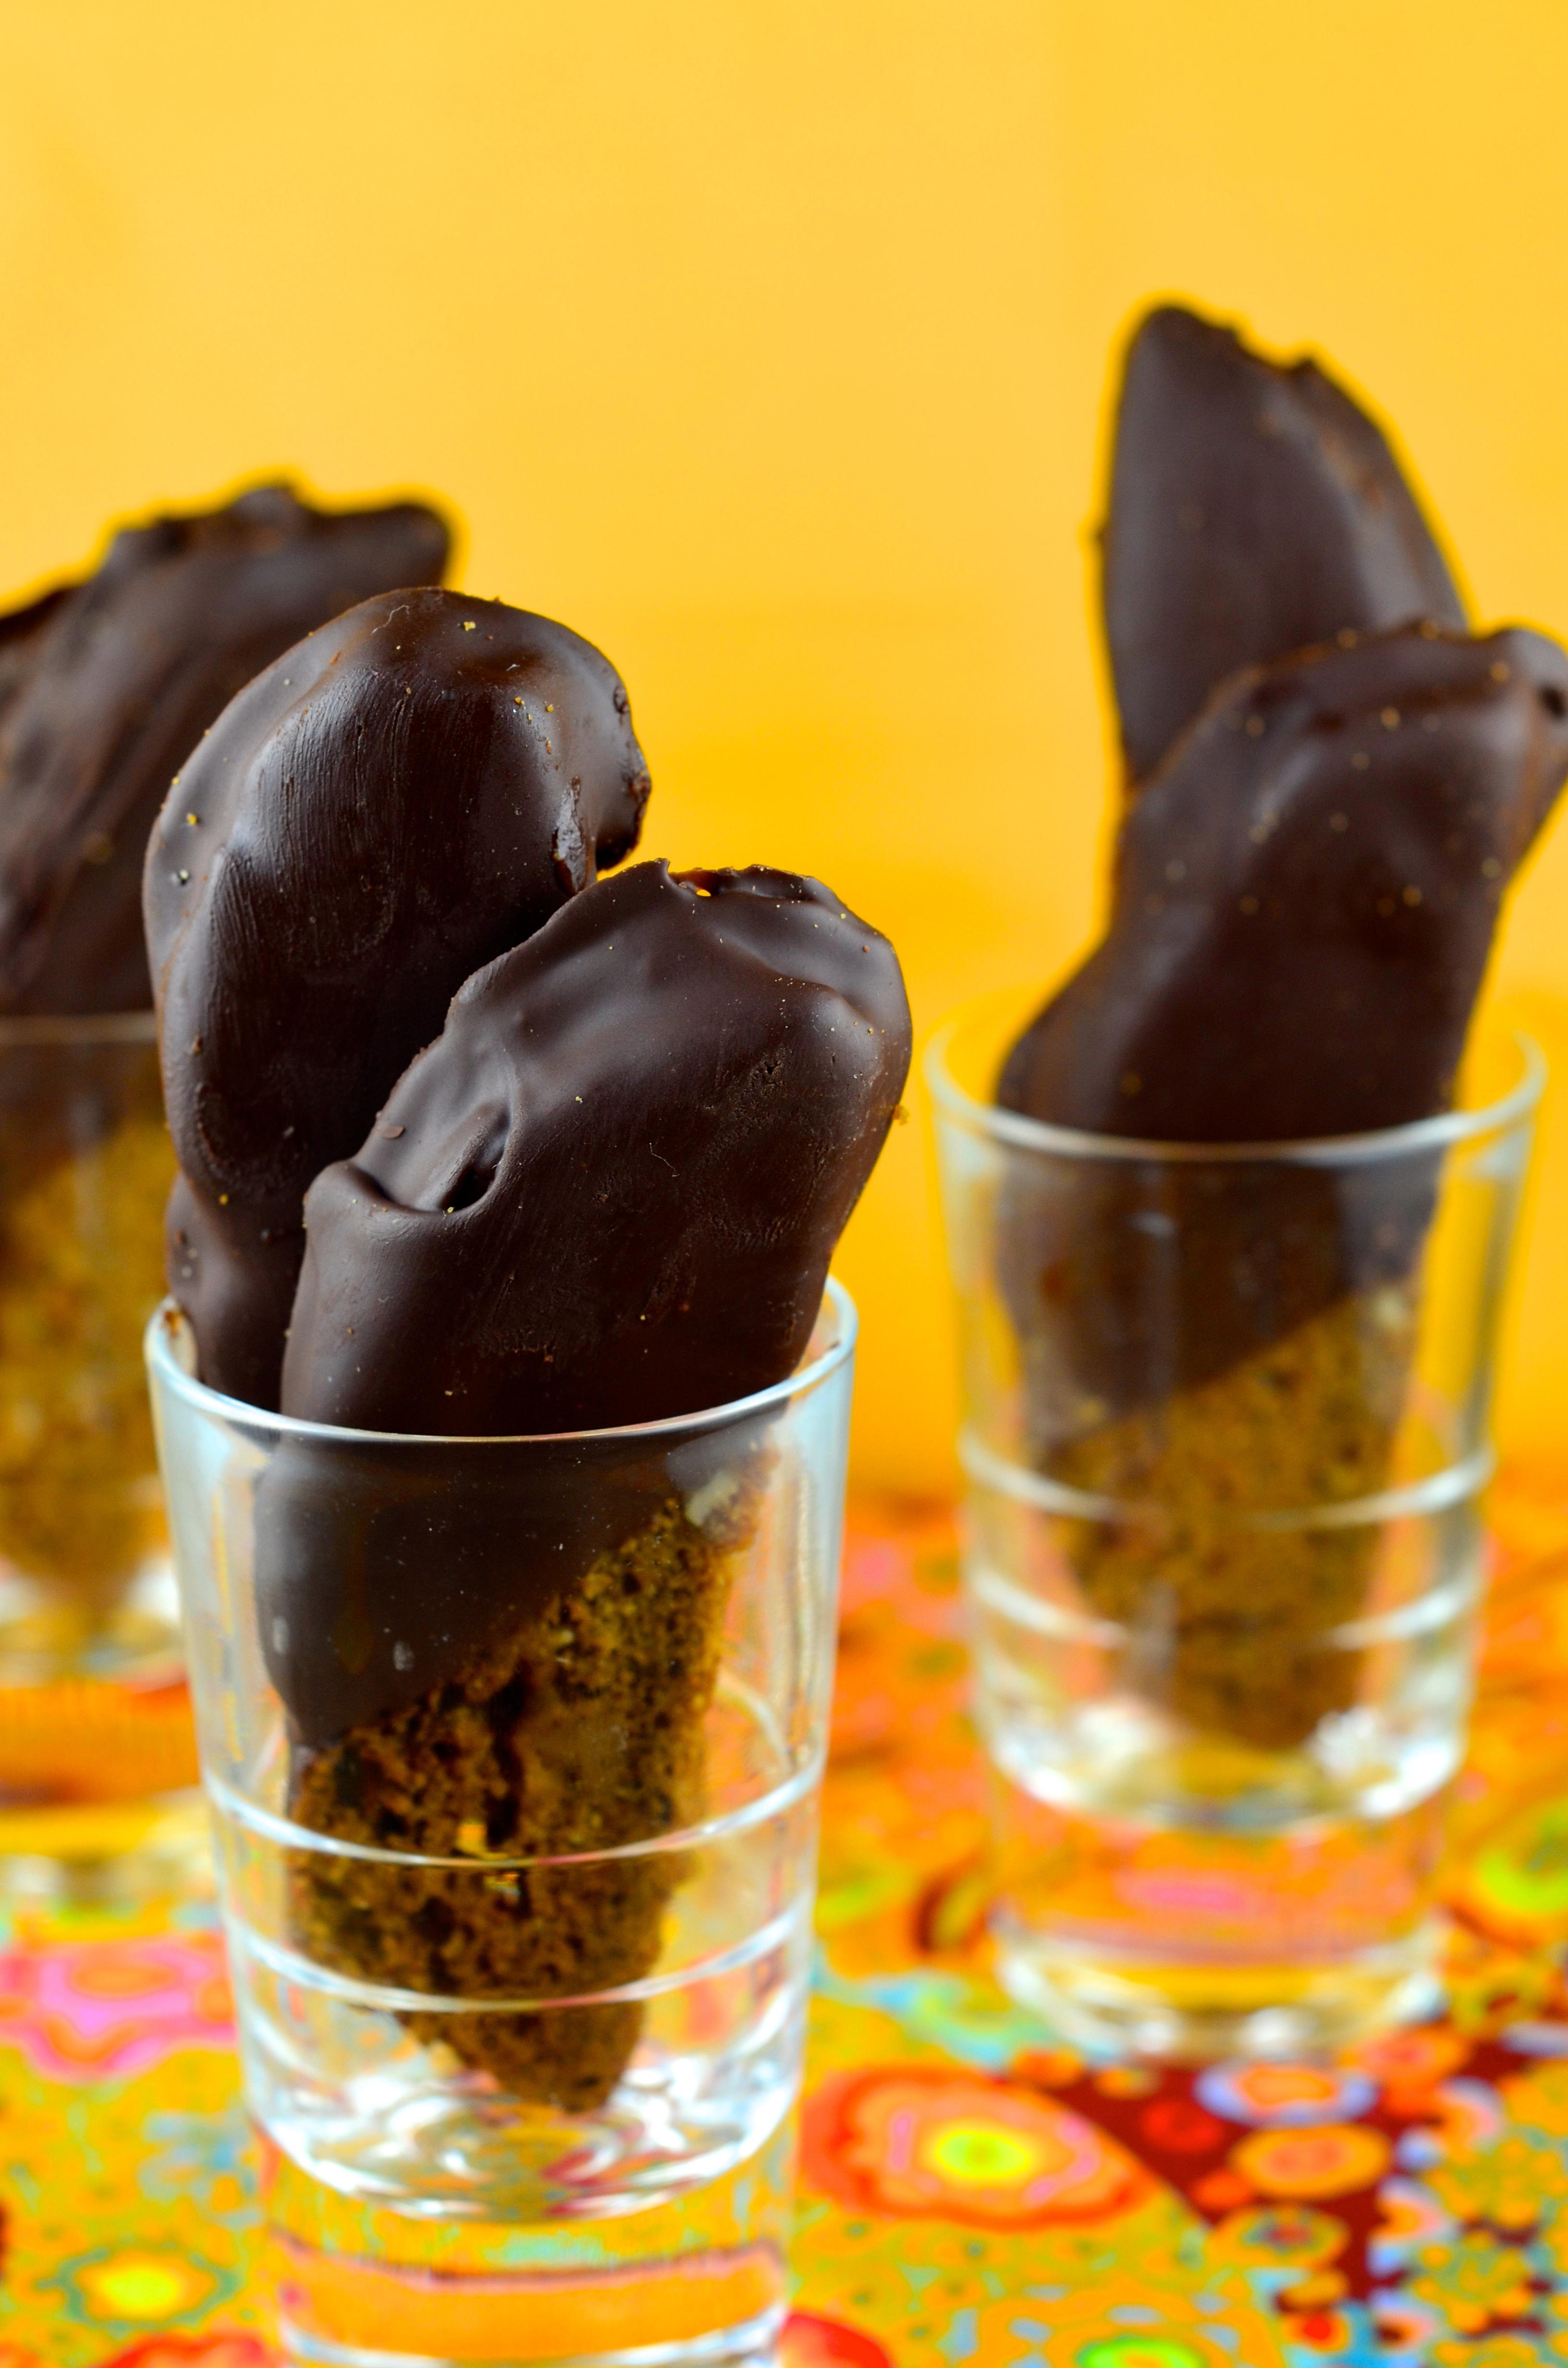 Hazelnut & Coffee Vegan Biscotti Dipped in Chocolate